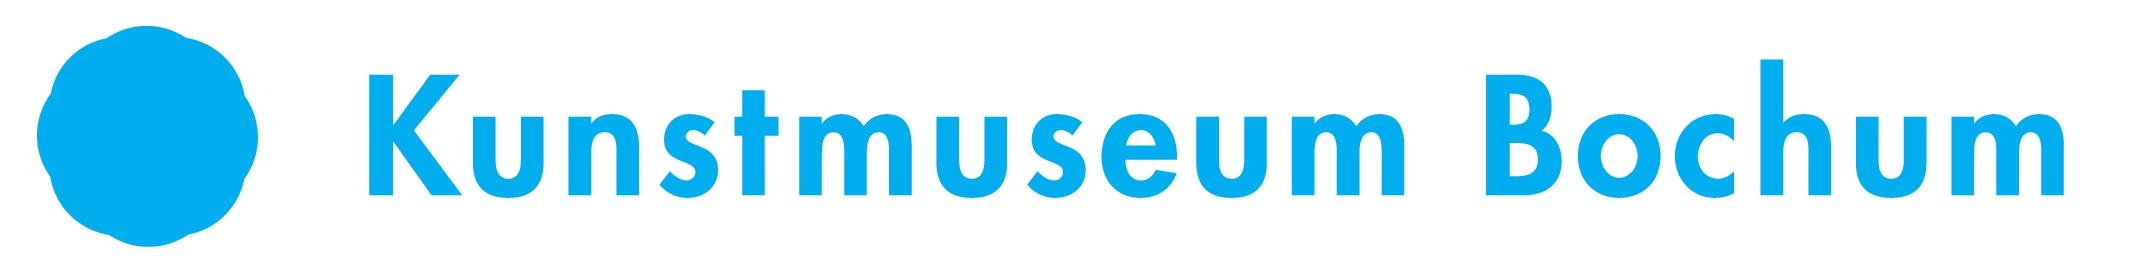 Logo_Kunstmuseum Bochum_klein